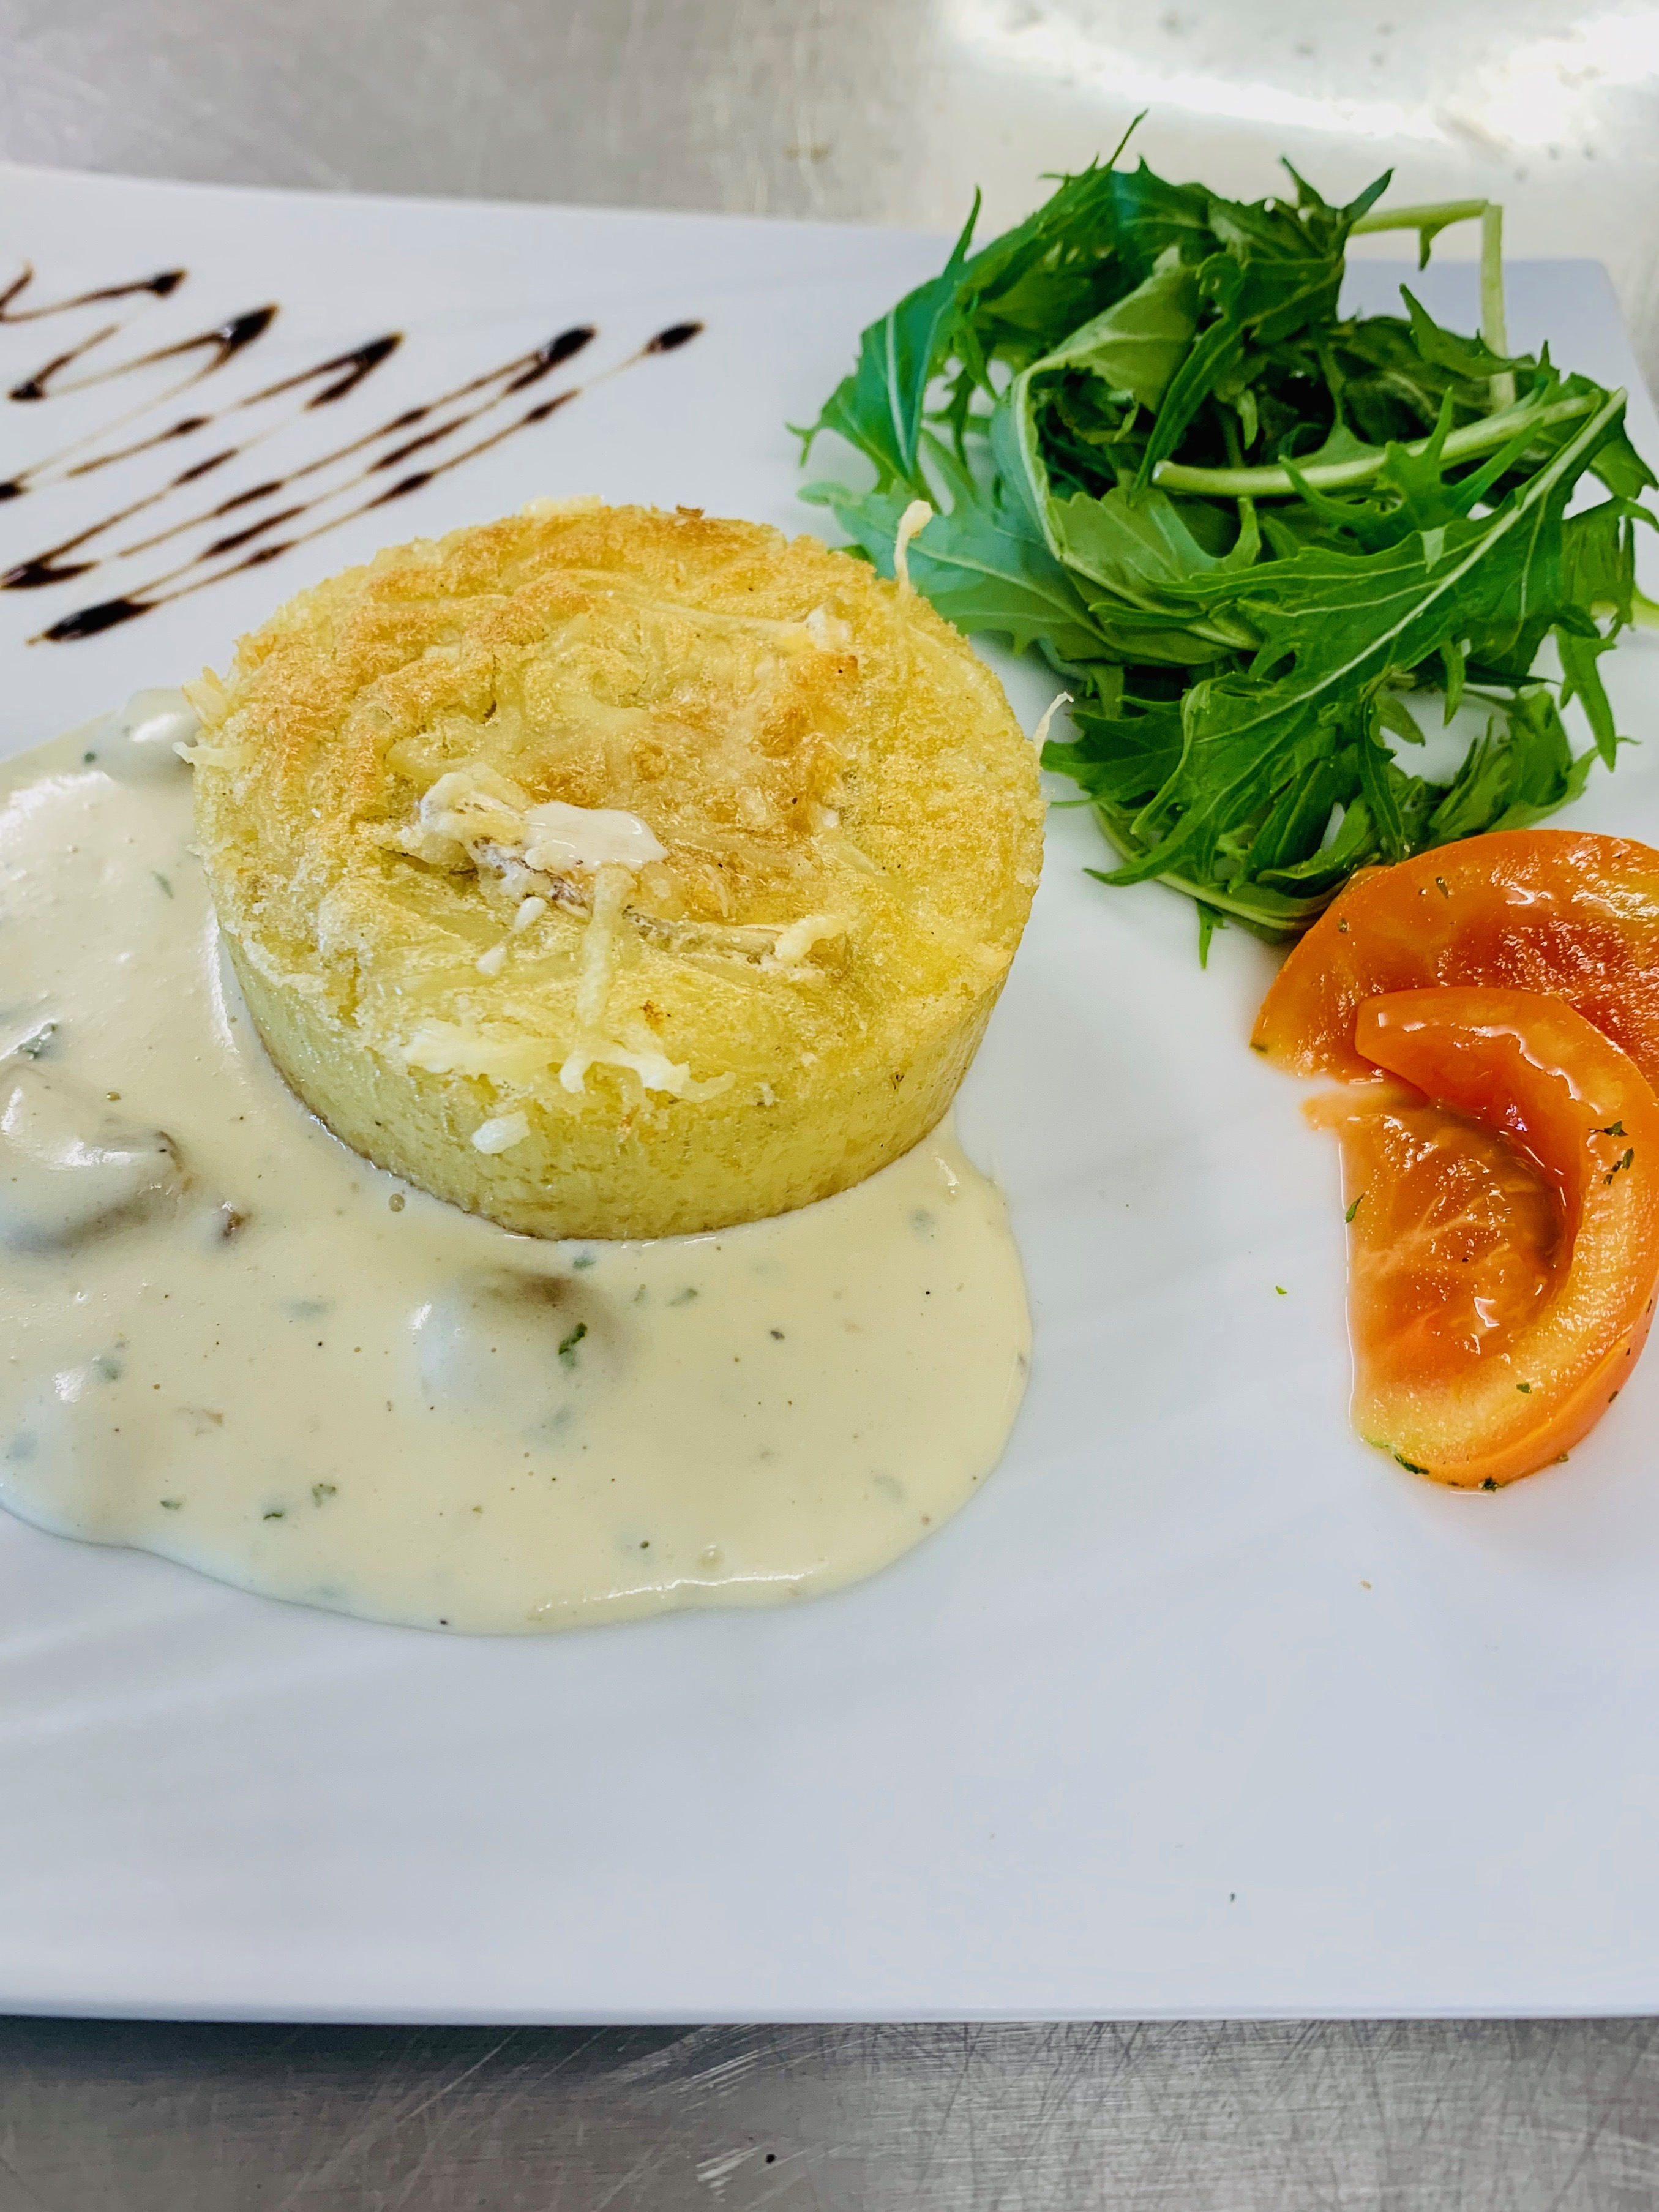 Brasserie / Snacking